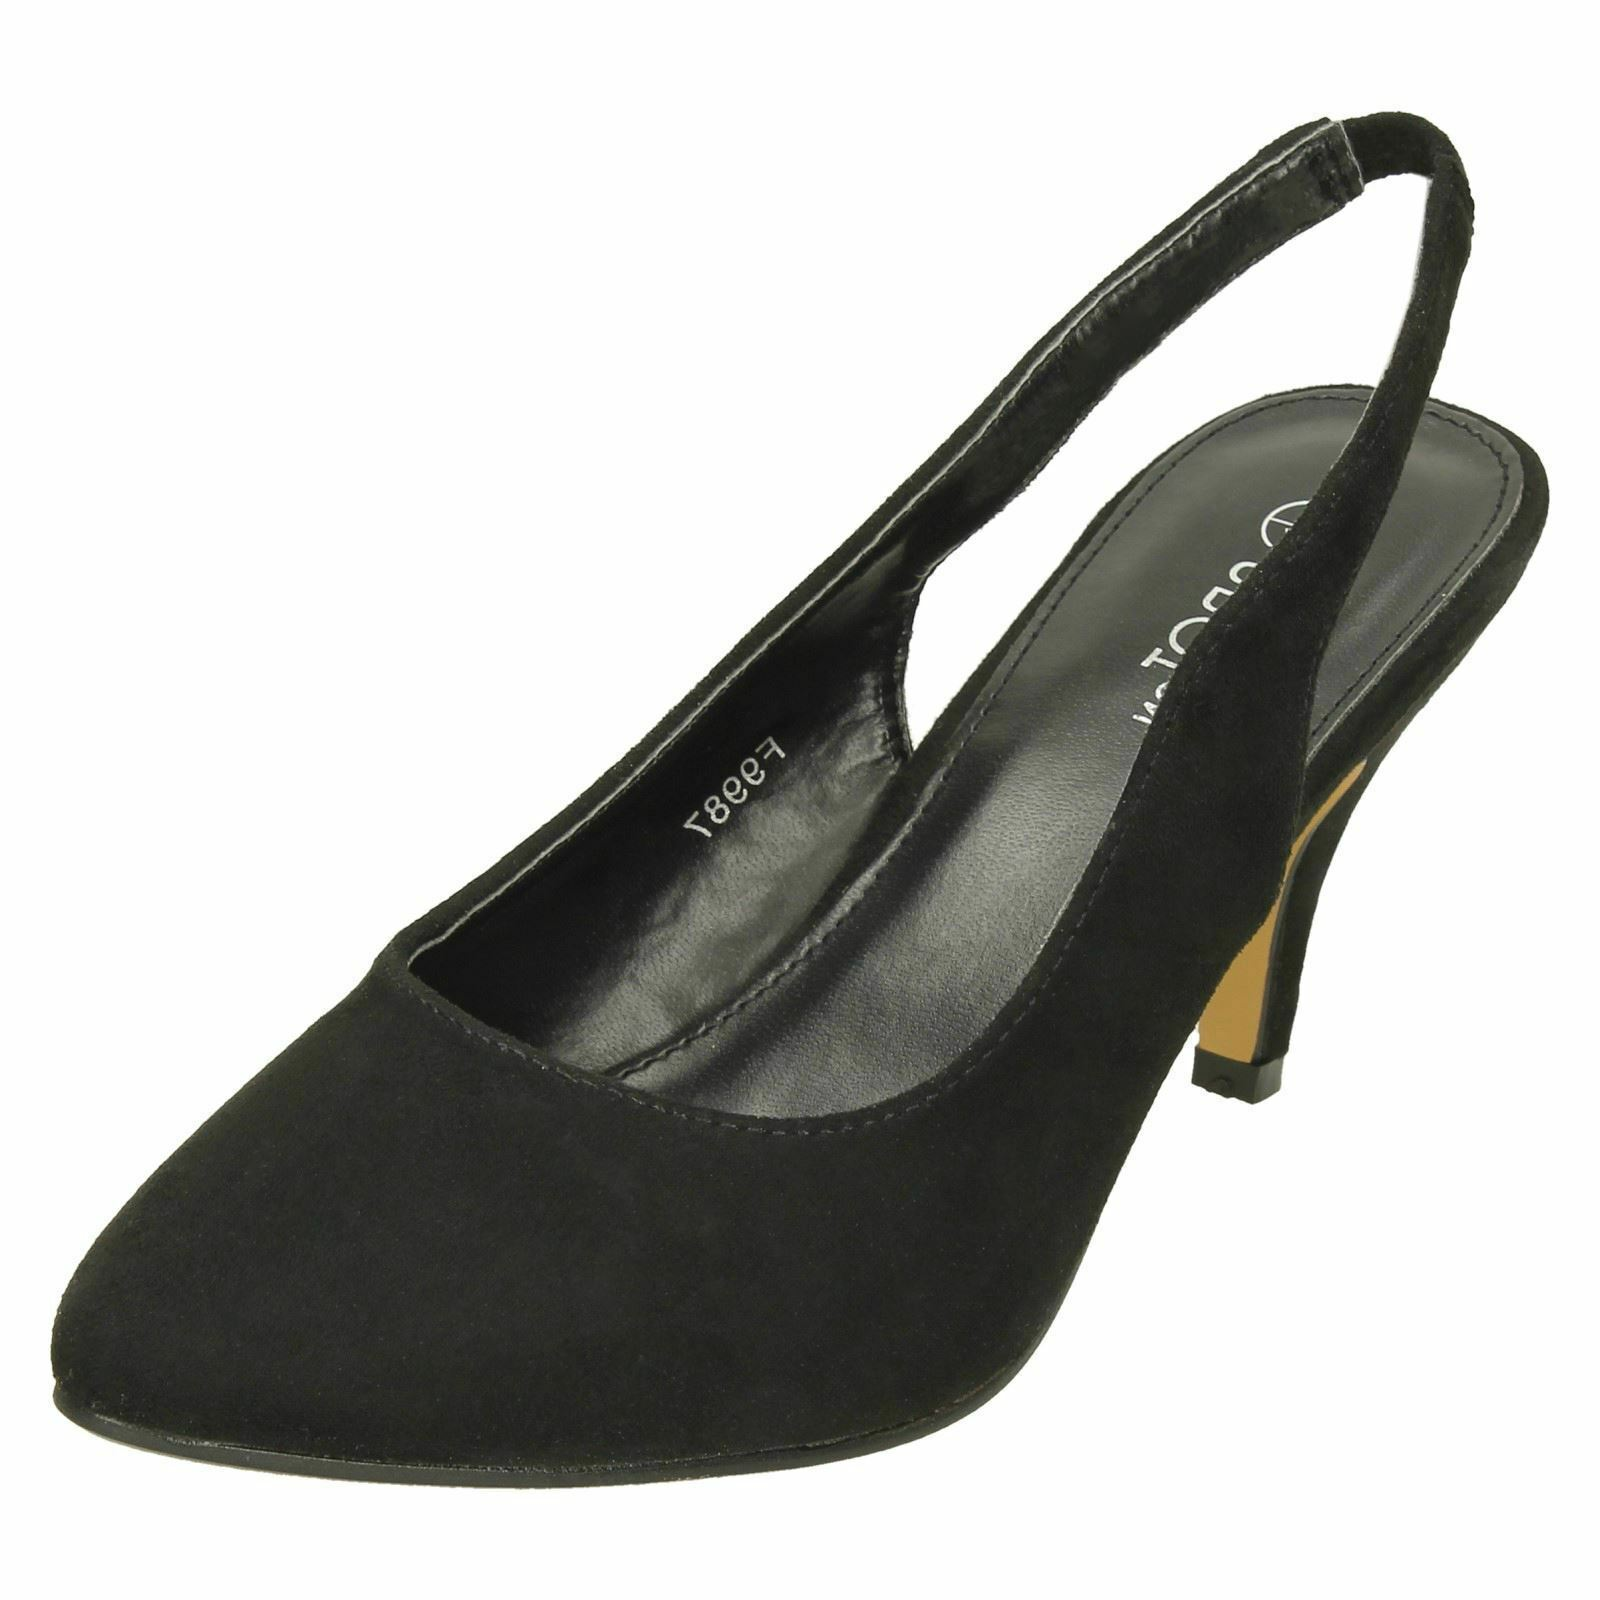 3eb9b35fa81 Ladies Spot on Mid Heel Slingback Court Shoes F9987 Black UK 6 ...